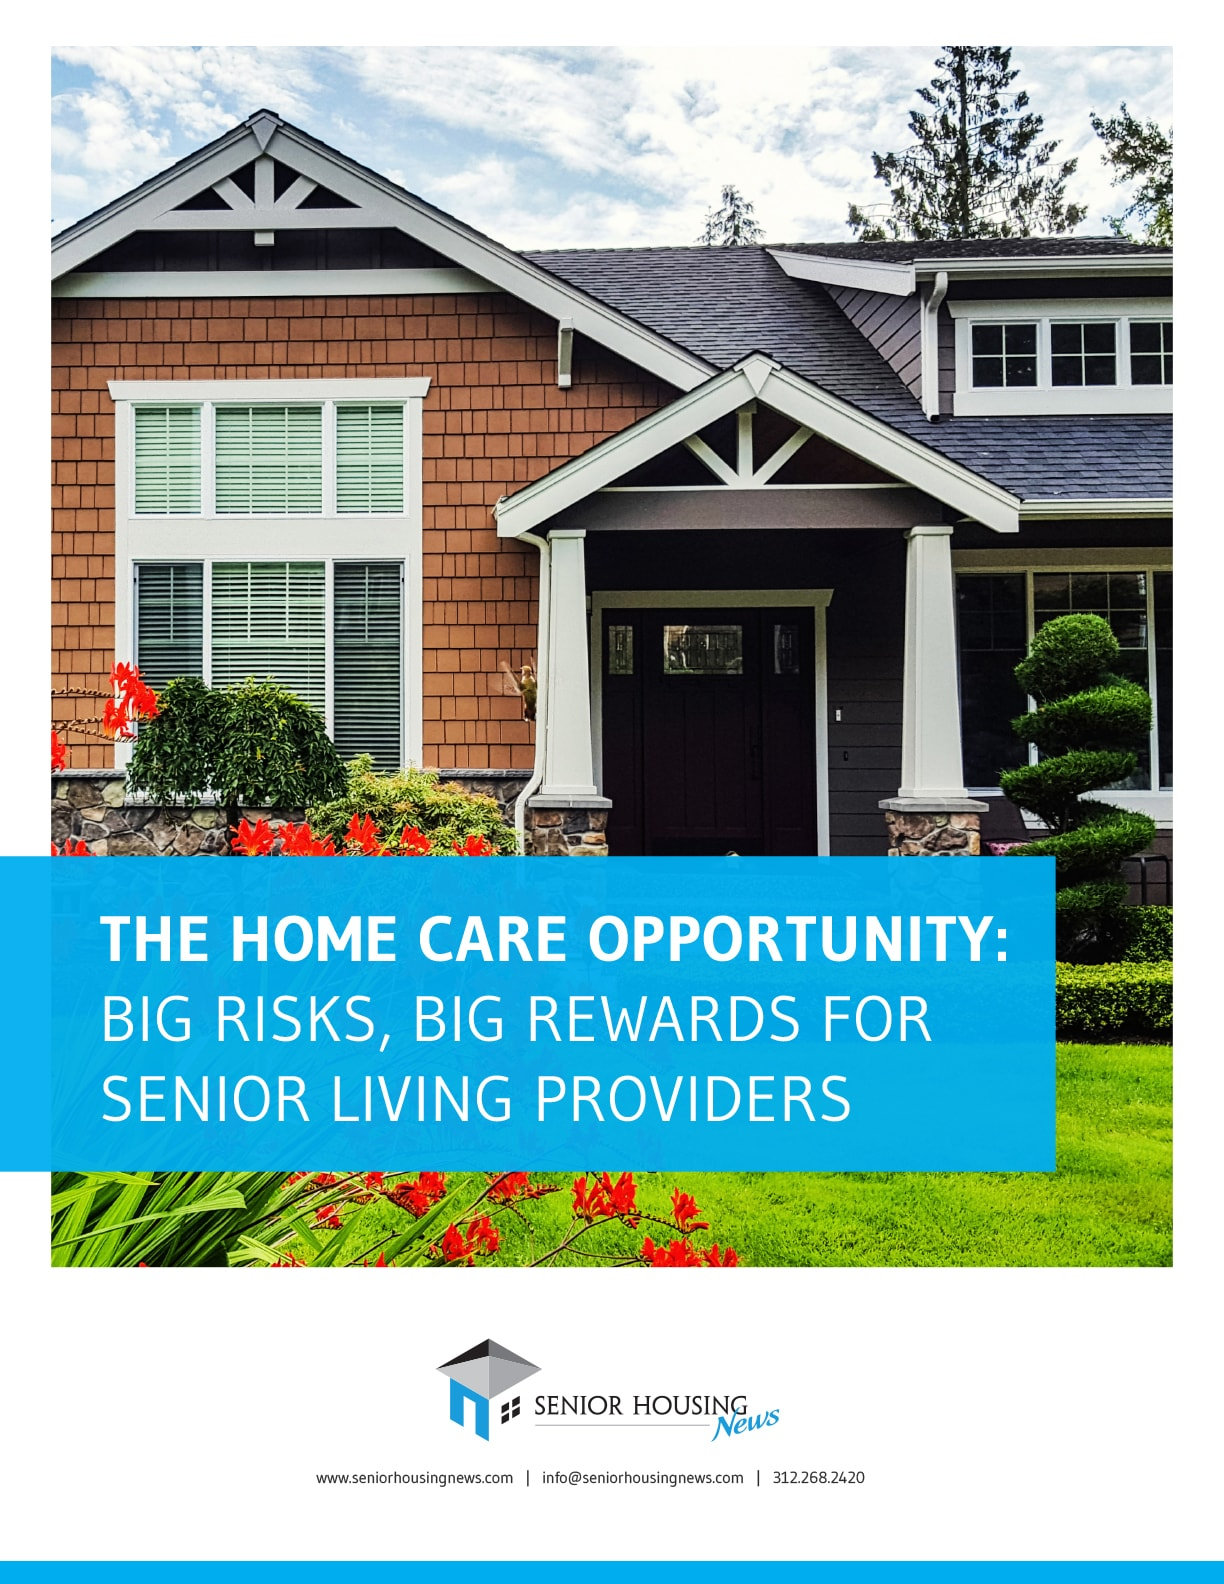 The Home Care Opportunity: Big Risks, Big Rewards For Senior Living Providers